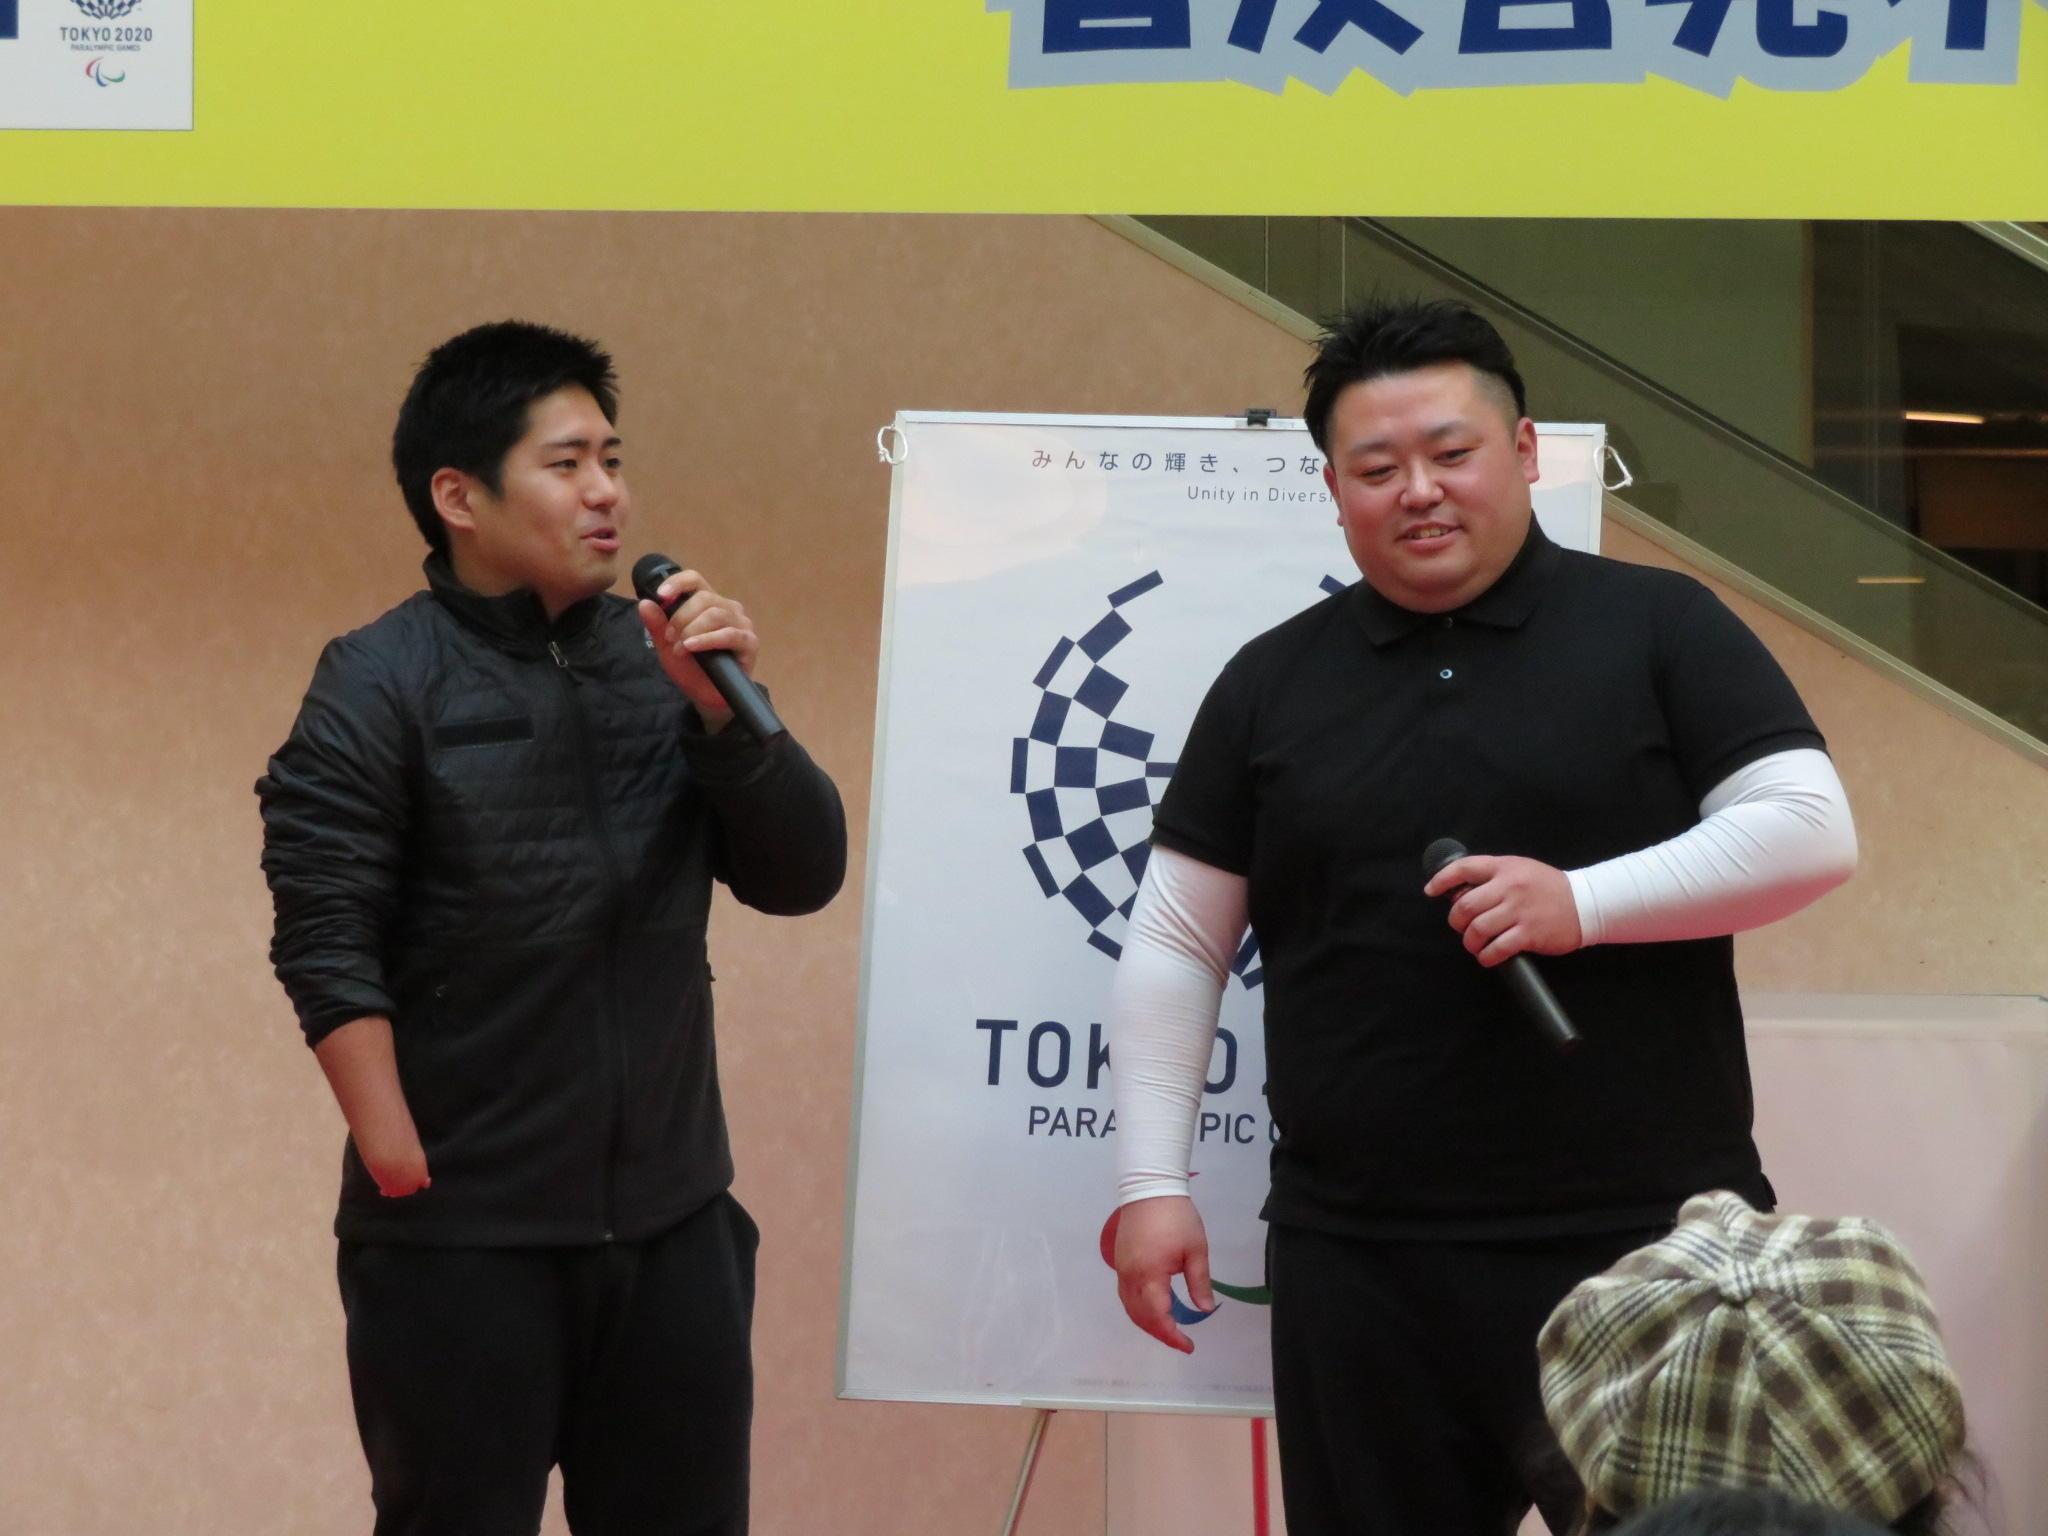 http://news.yoshimoto.co.jp/20180206131408-62a3aba9f9ef57d0bf1584ac744d7fb201d92c34.jpg